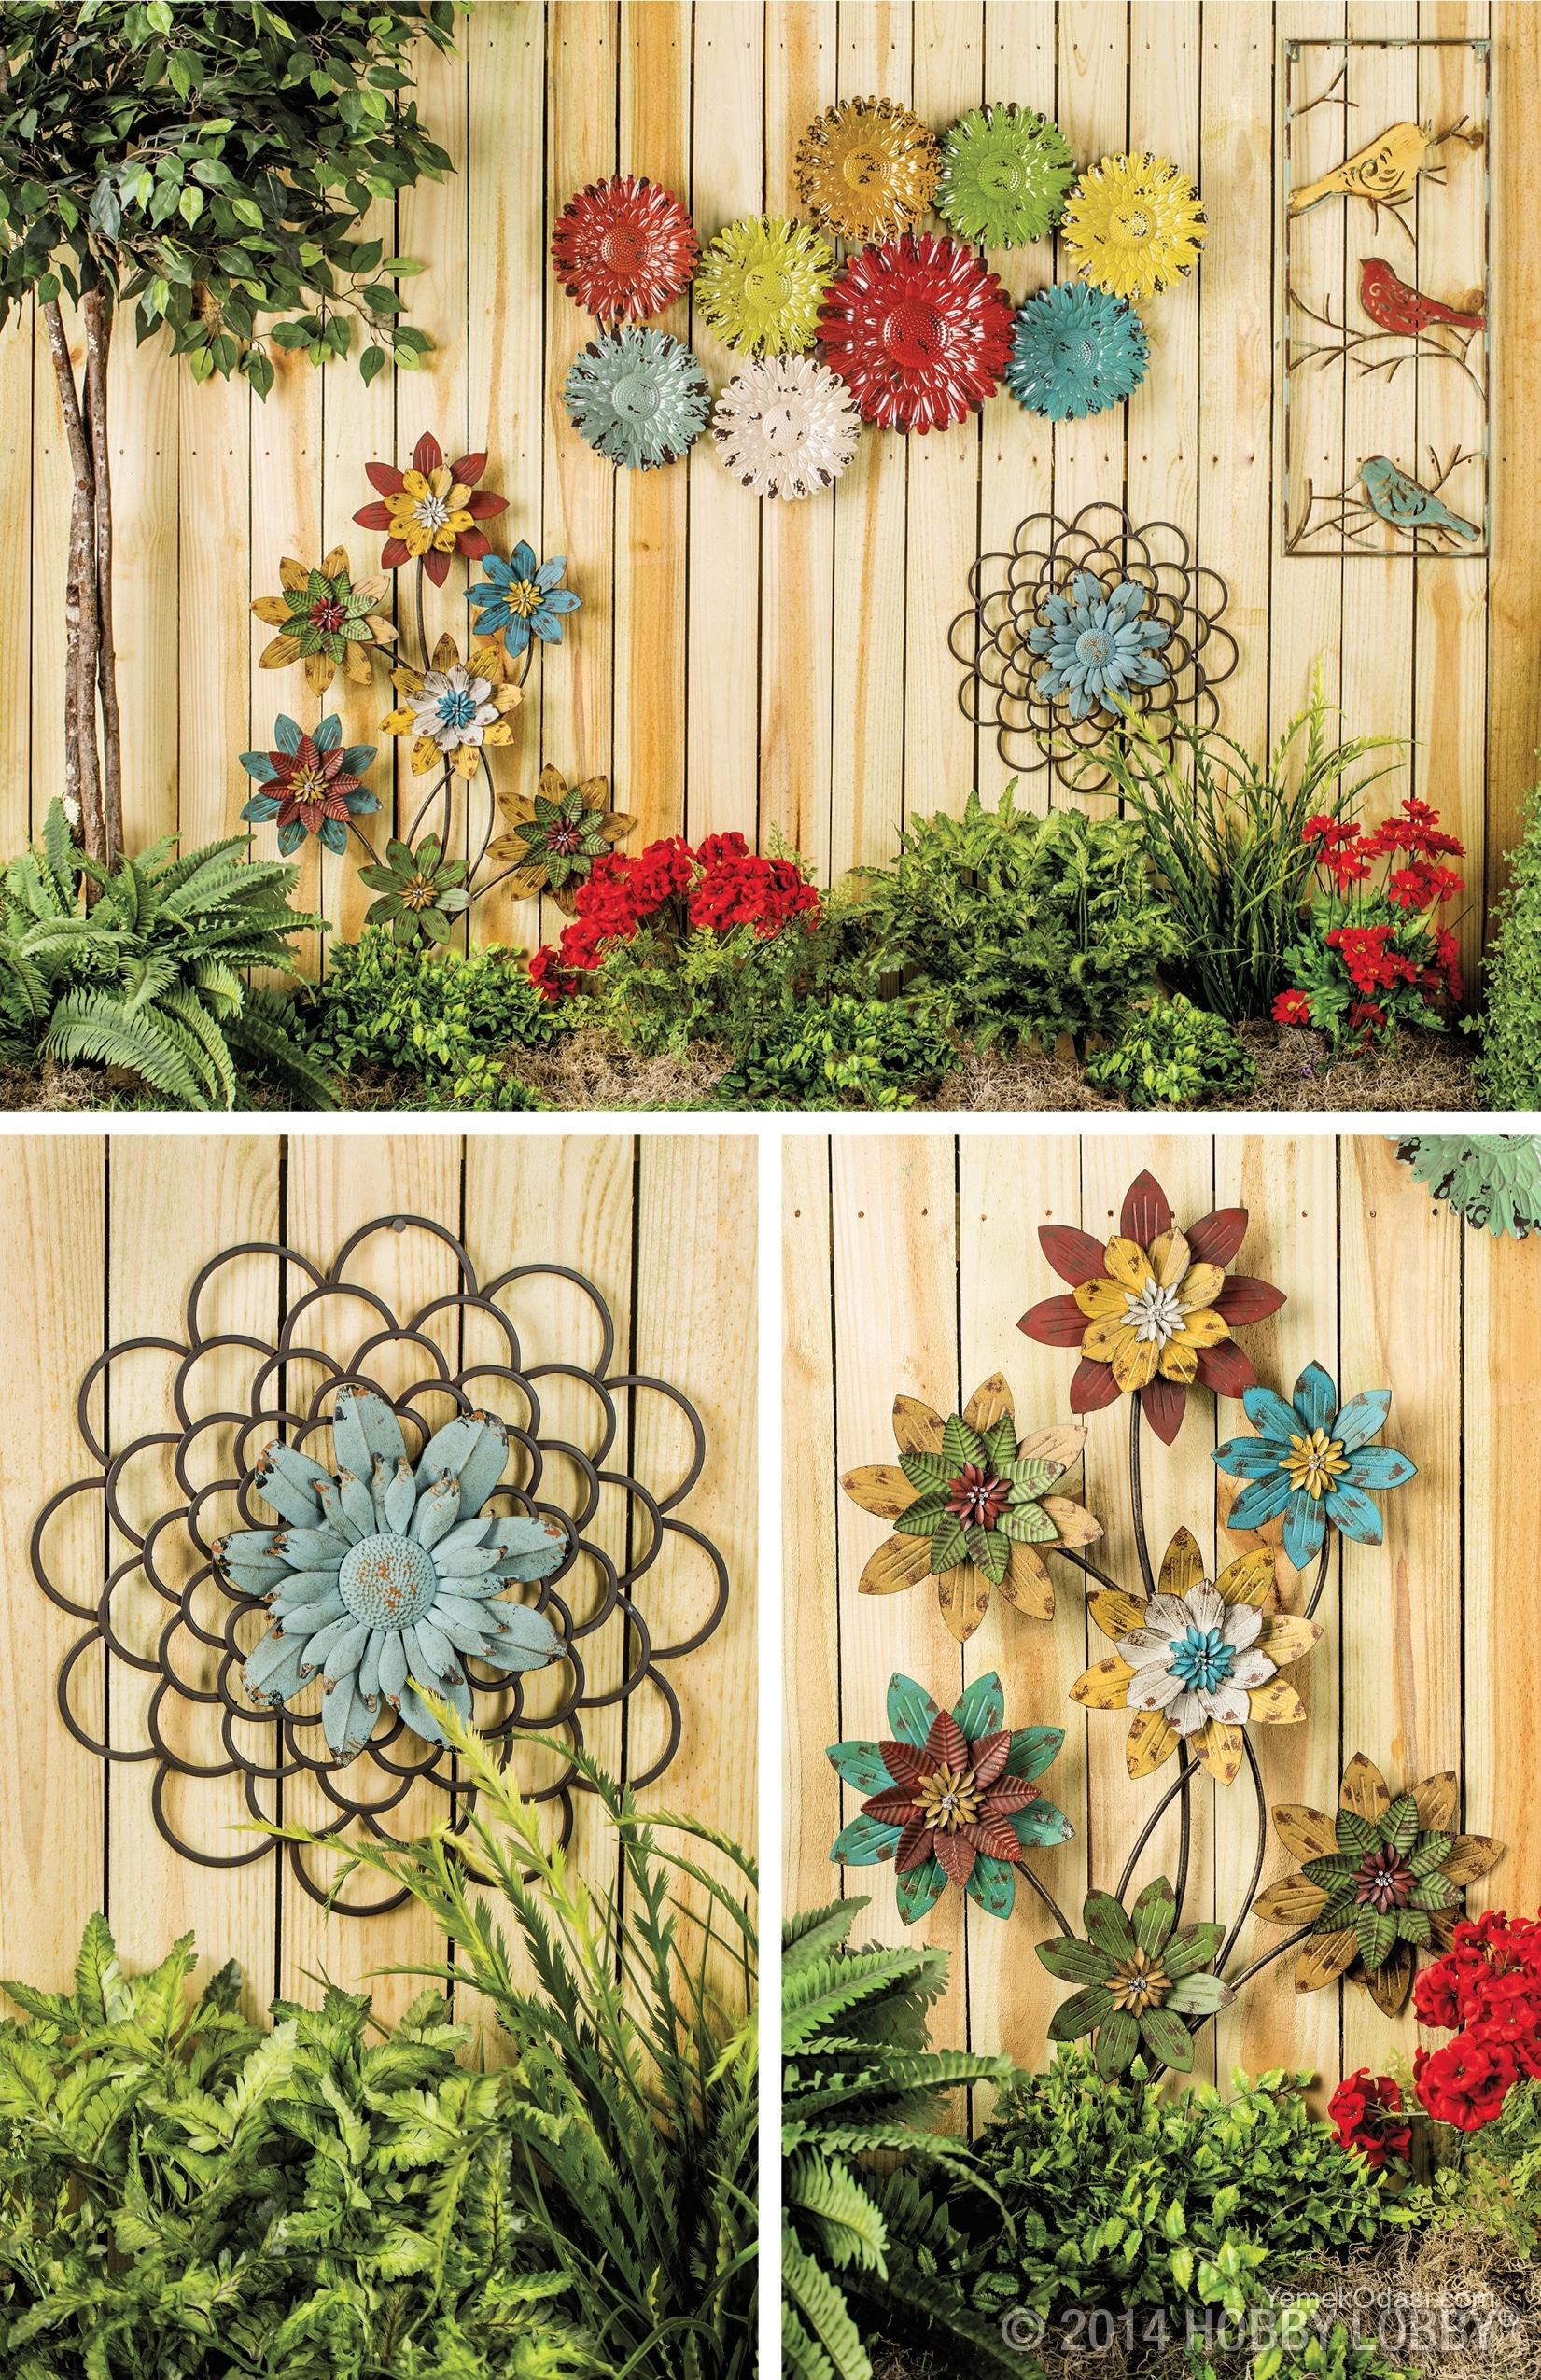 Bahçe duvarı ahşap süsleme